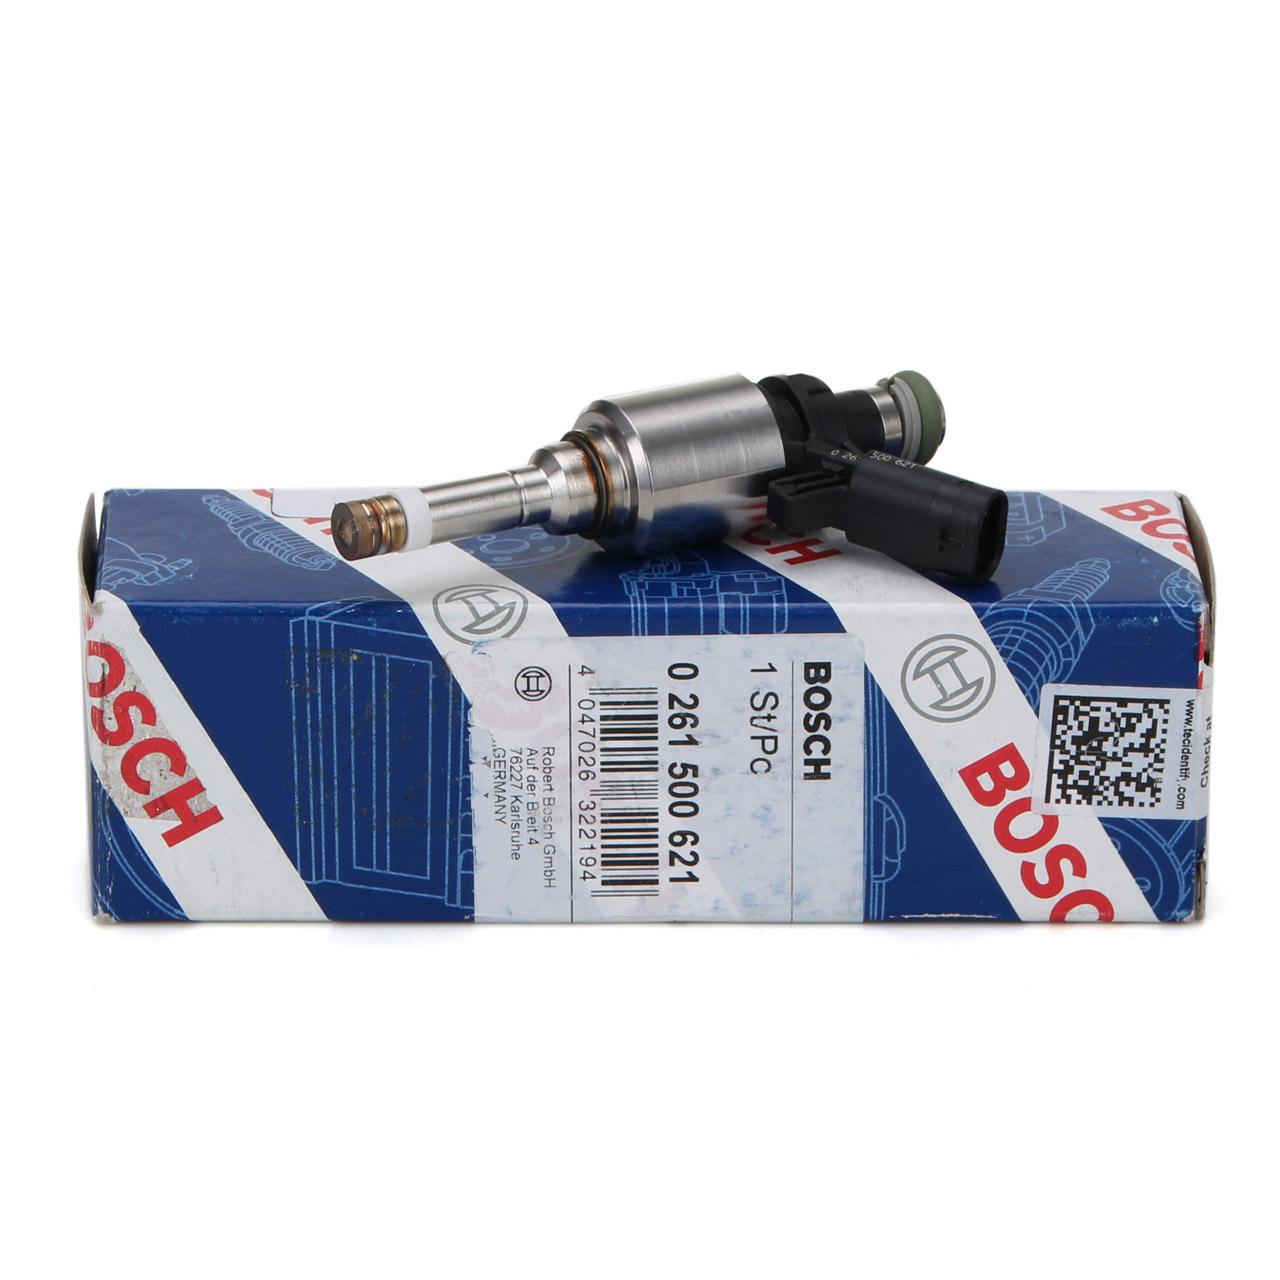 BOSCH 026150001A Einspritzventil AUDI A3 8P A6 C7 VW Golf V VI Passat 2.0 06H906036AB